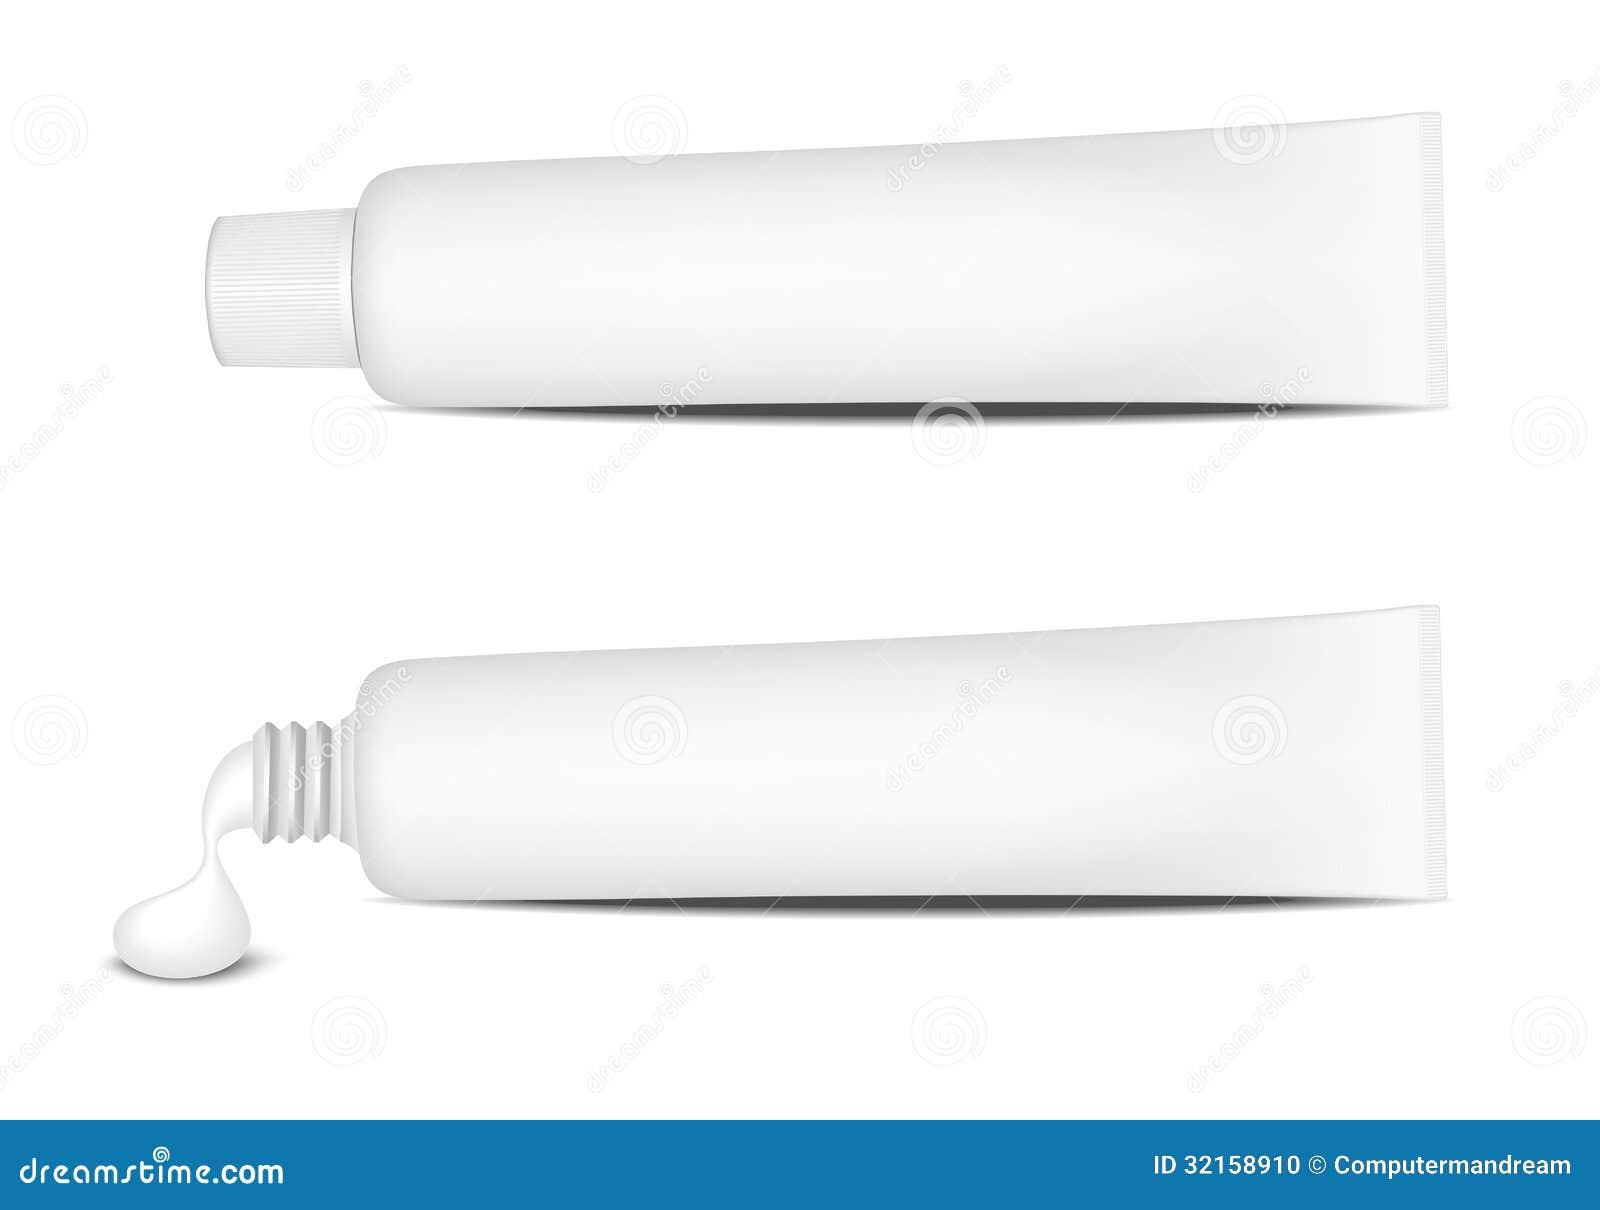 Toothpaste Tube Stock Photo Image 32158910